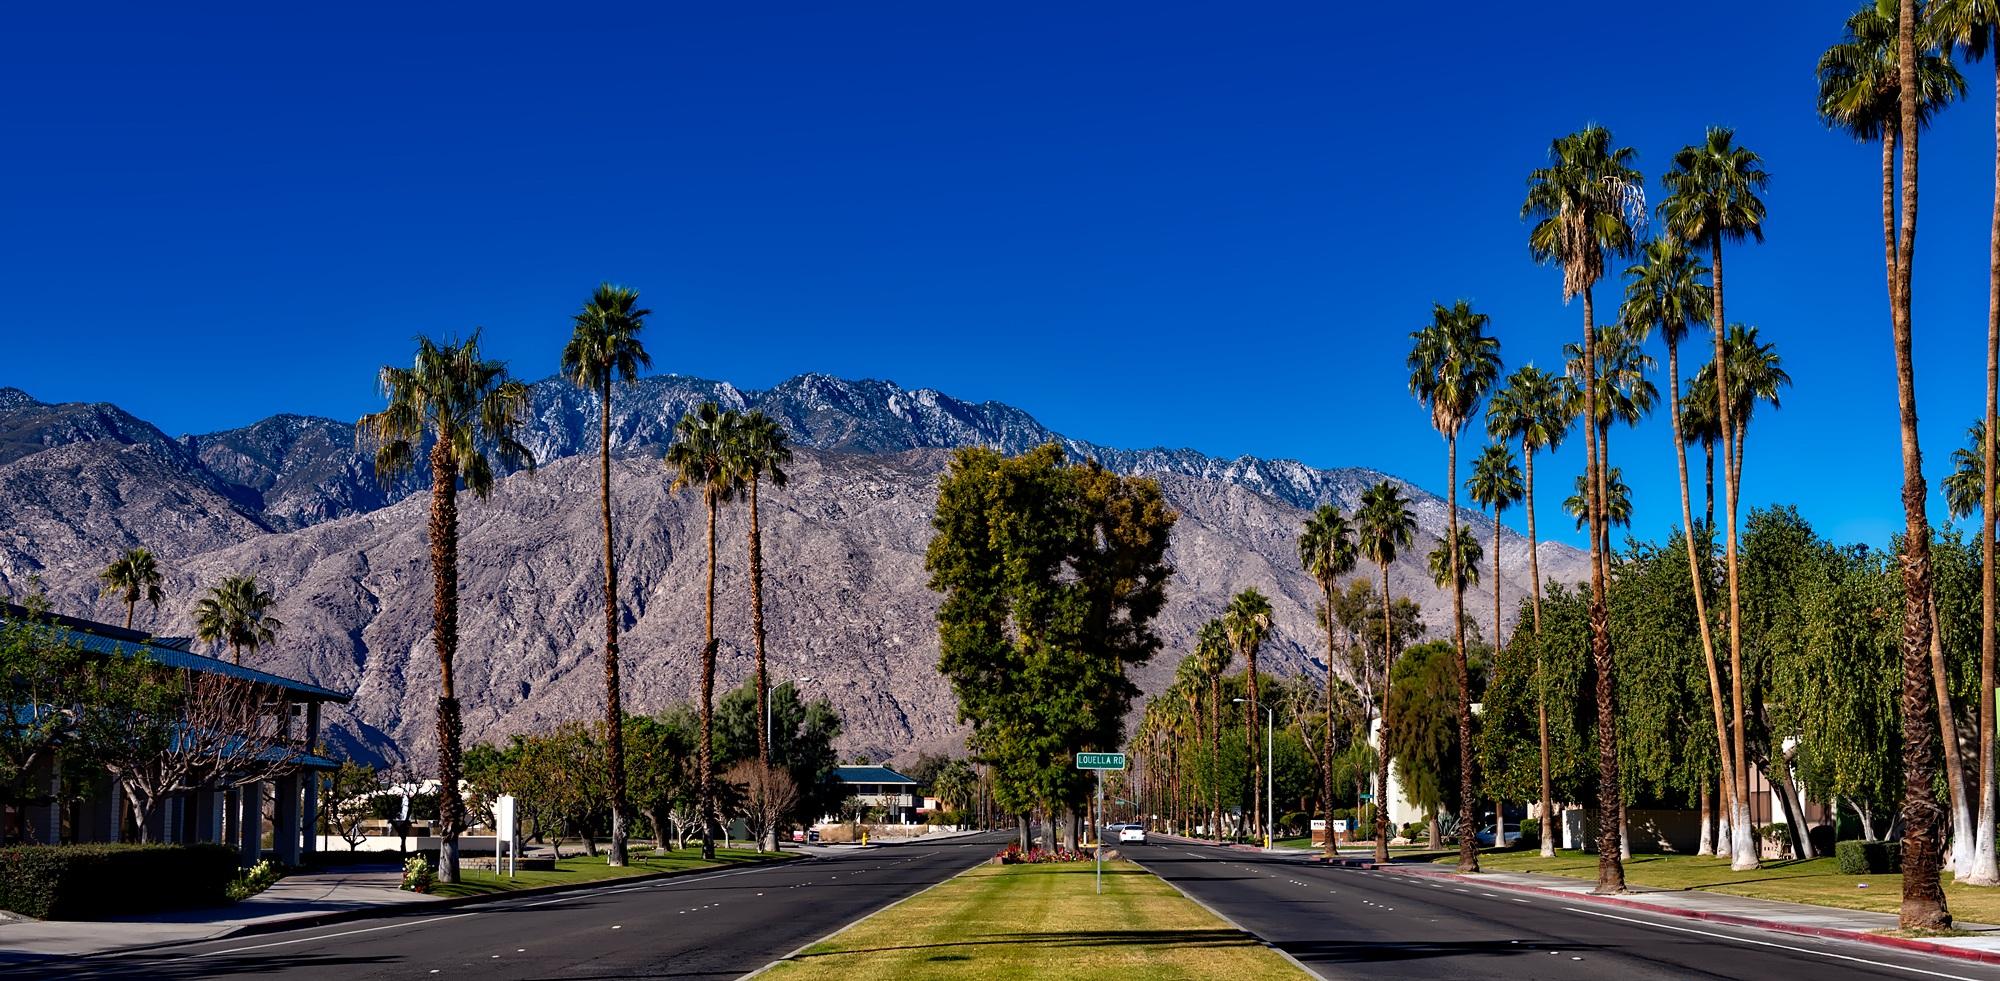 Weather Desert Hot Springs Ca >> Free Images : landscape, tree, road, street, desert, city, urban, mountain range, cityscape ...